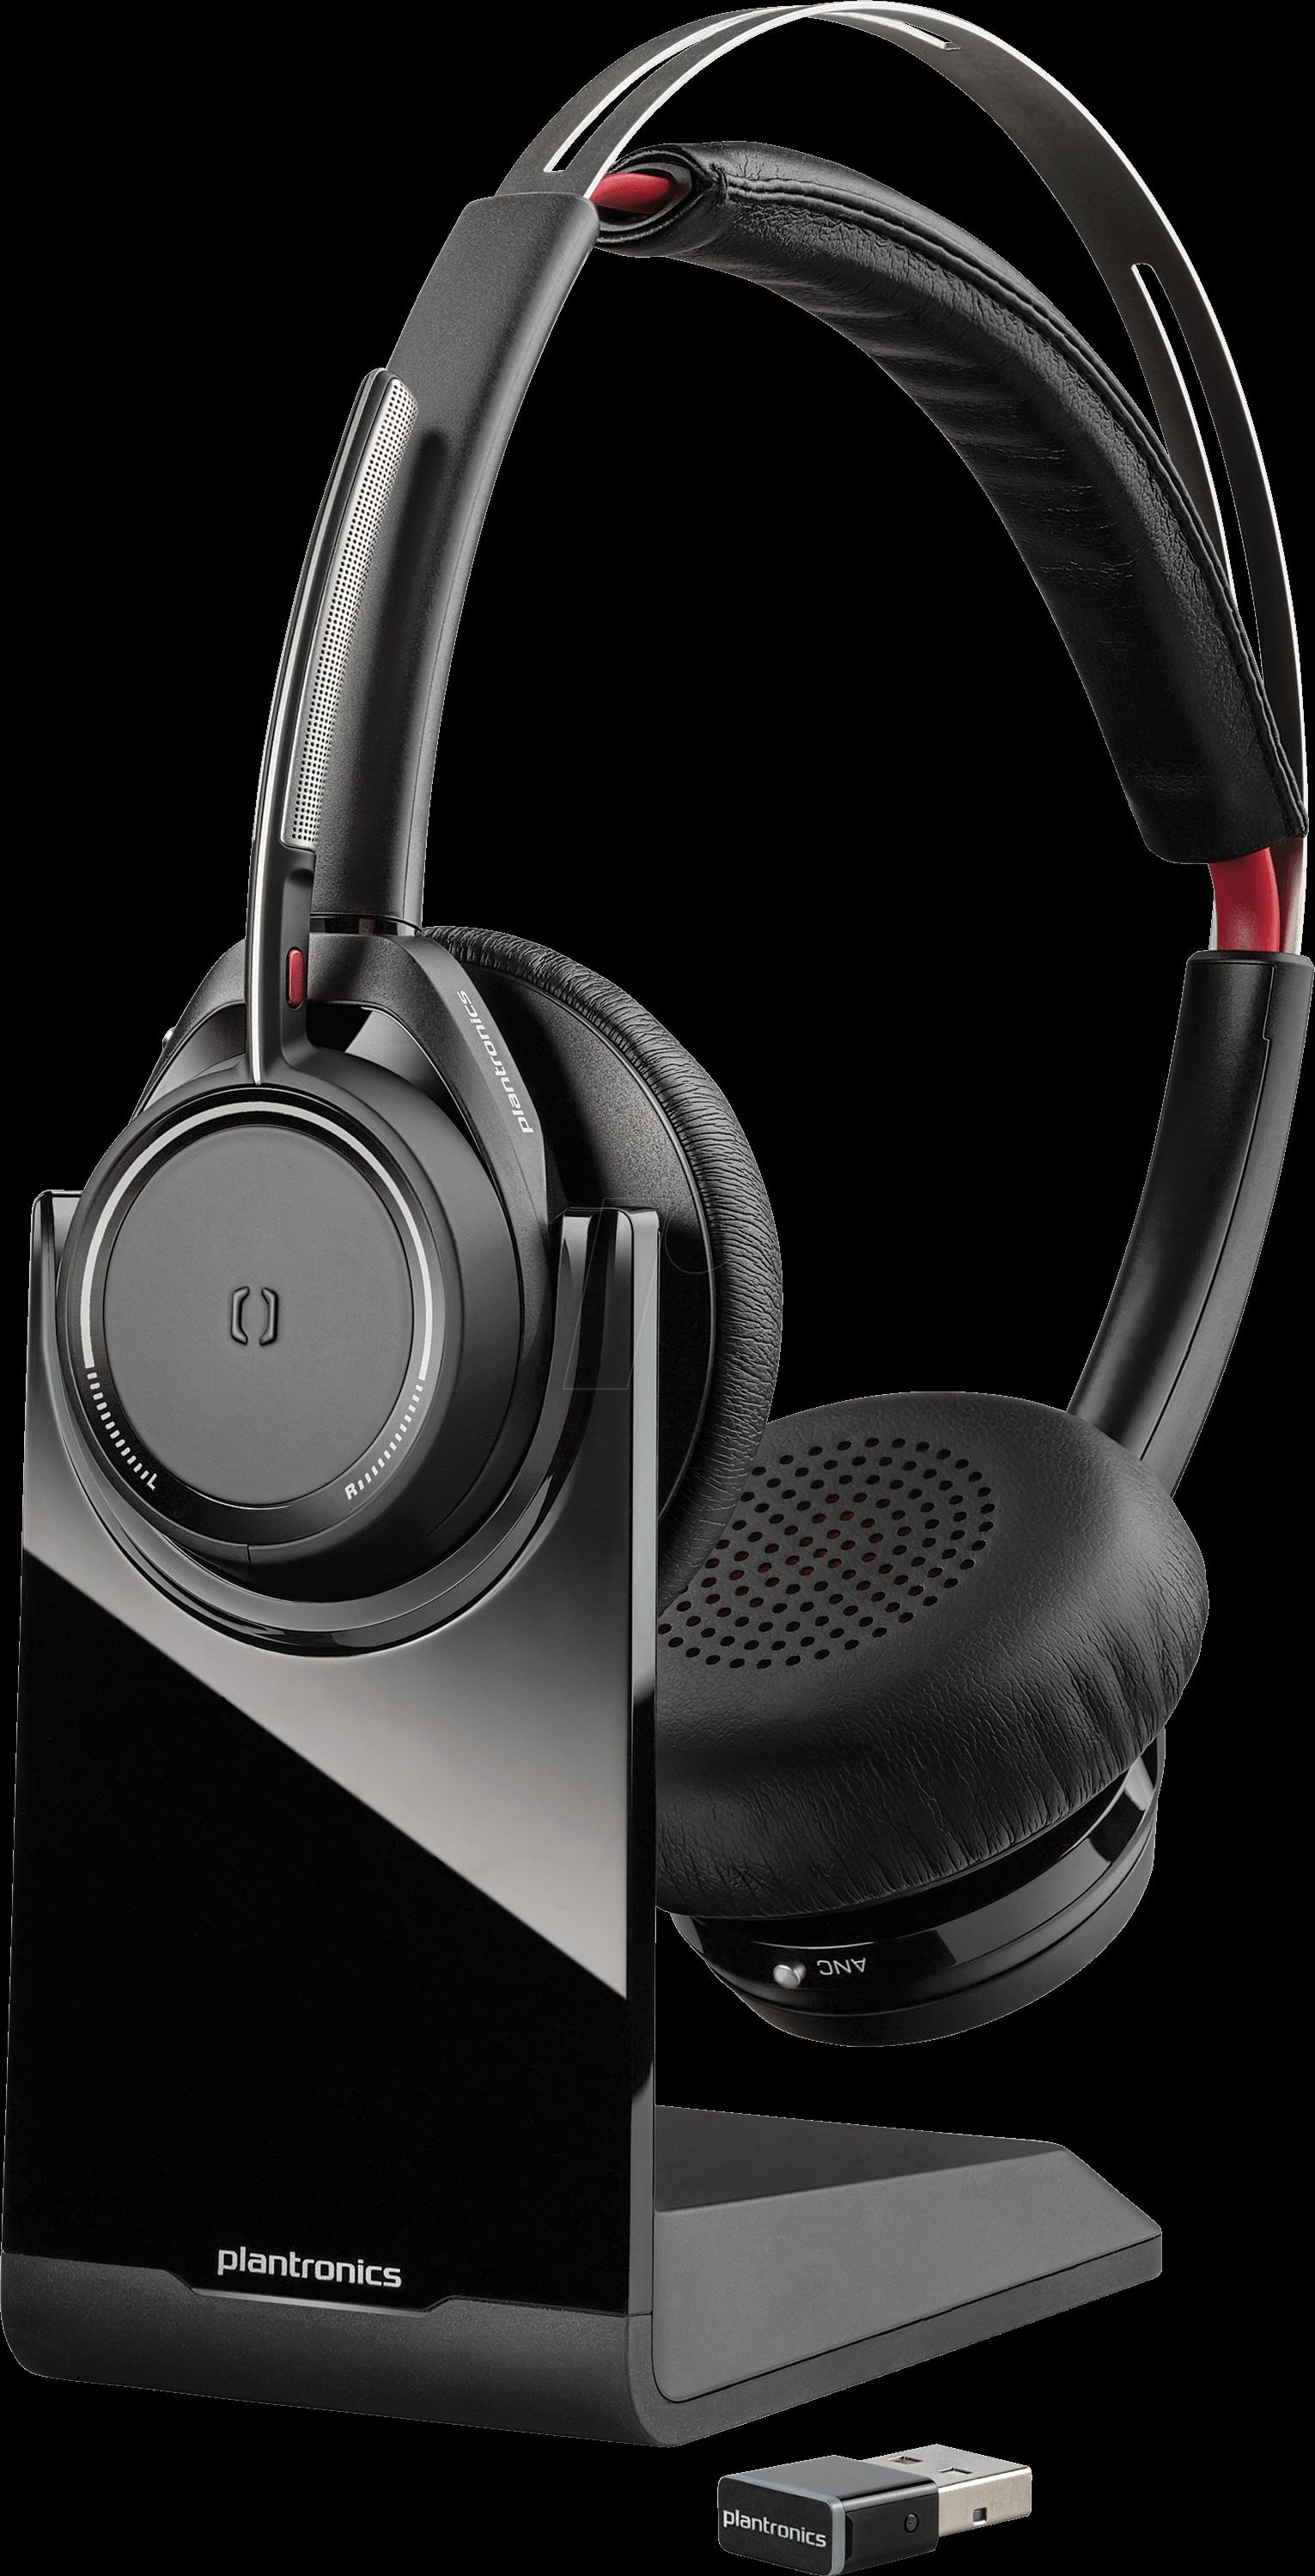 PLAN VF B825 - Headset, Bluetooth, Stereo, Voyager Focus B825